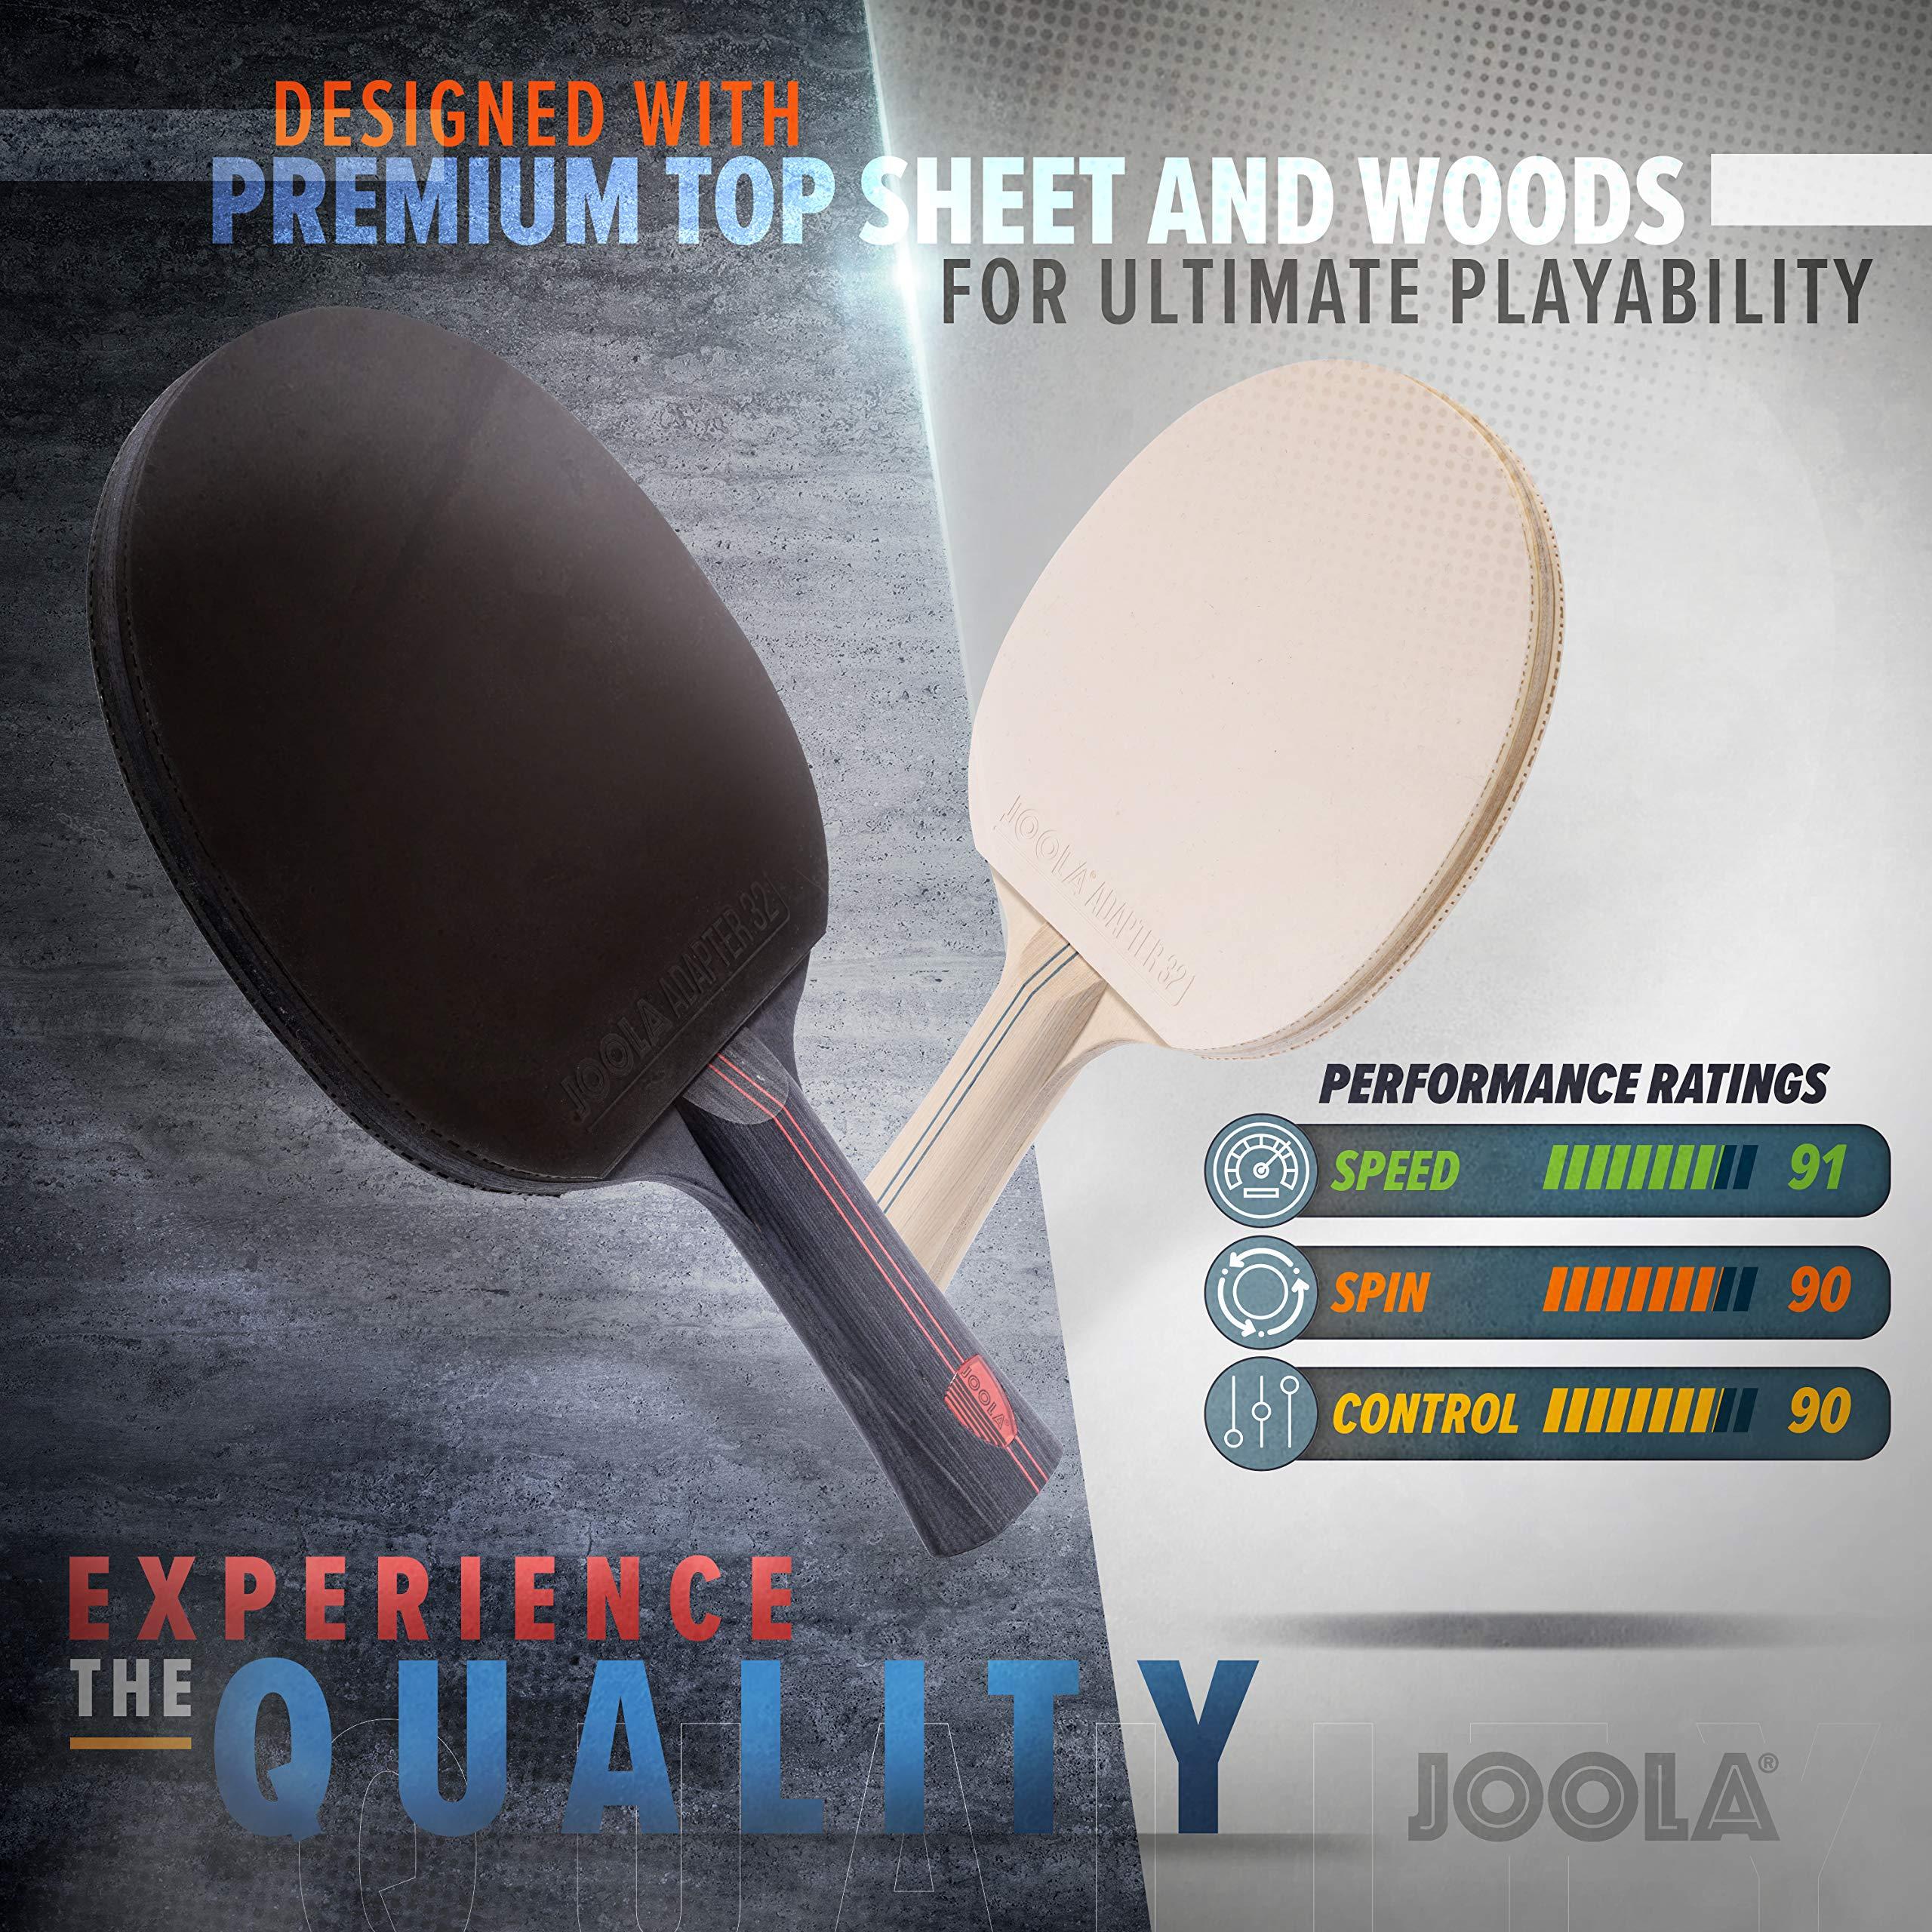 Amazon com: JOOLA North America: Rackets